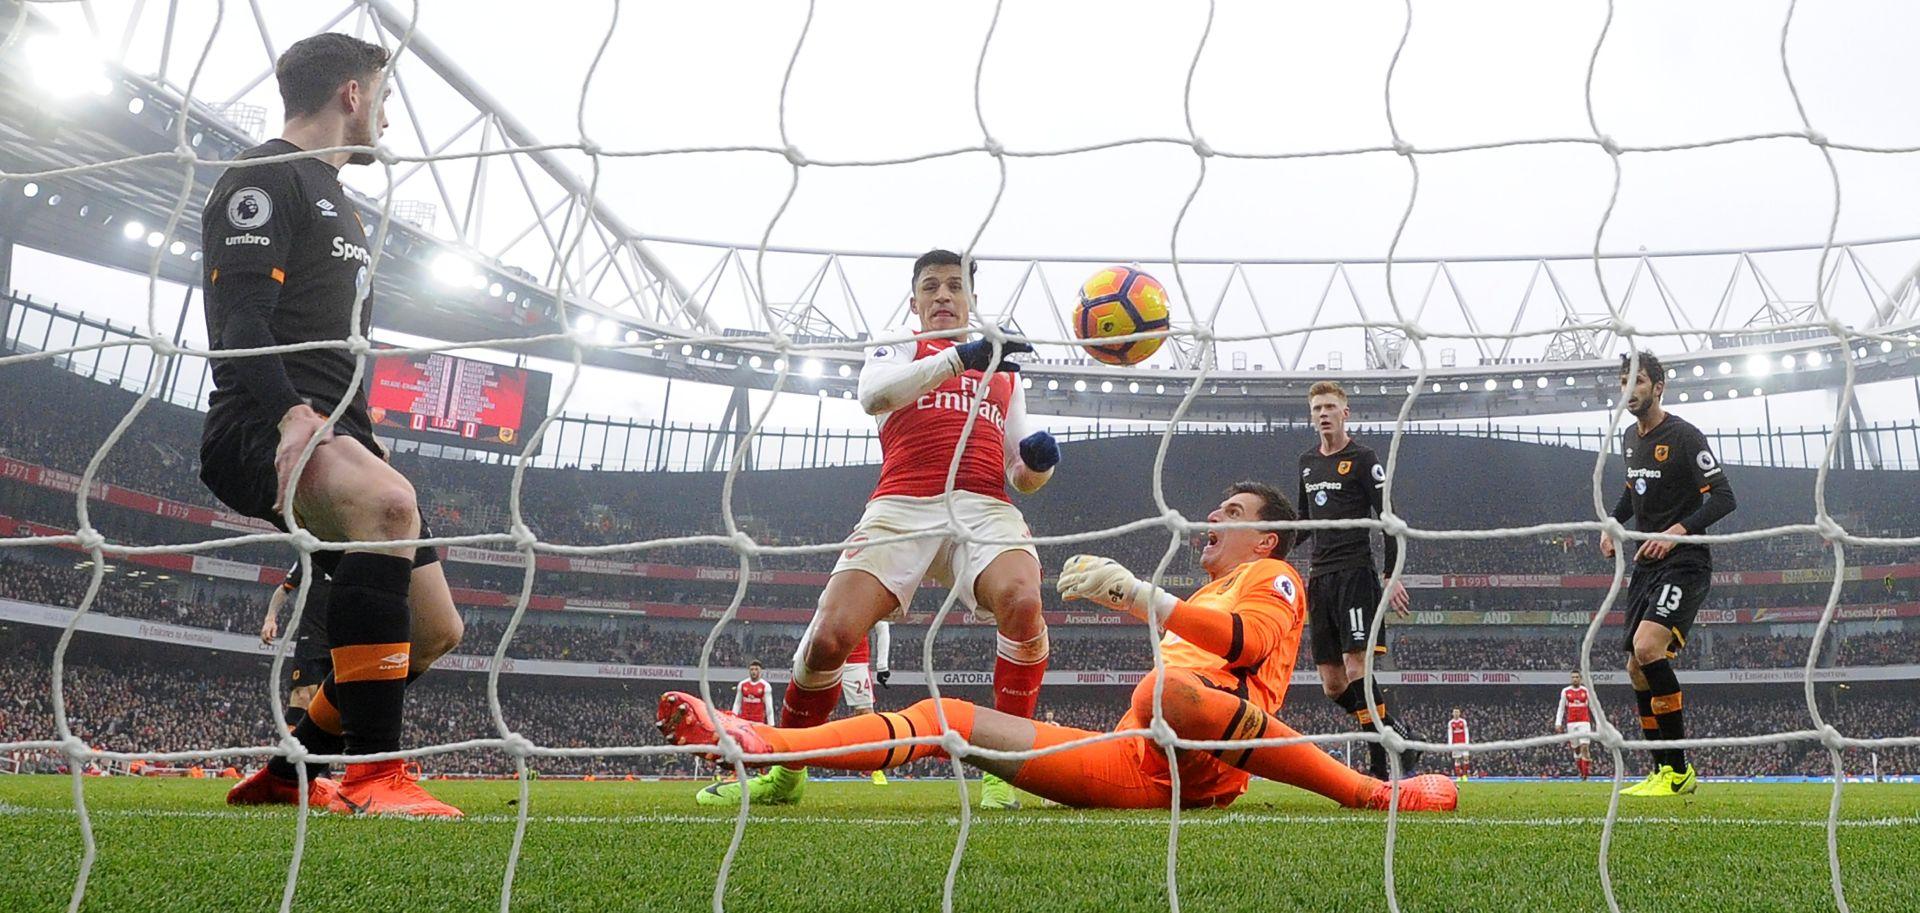 VIDEO: PREMIERLIGA Arsenal slavio, kontroverze oko vodećeg pogotka Sancheza